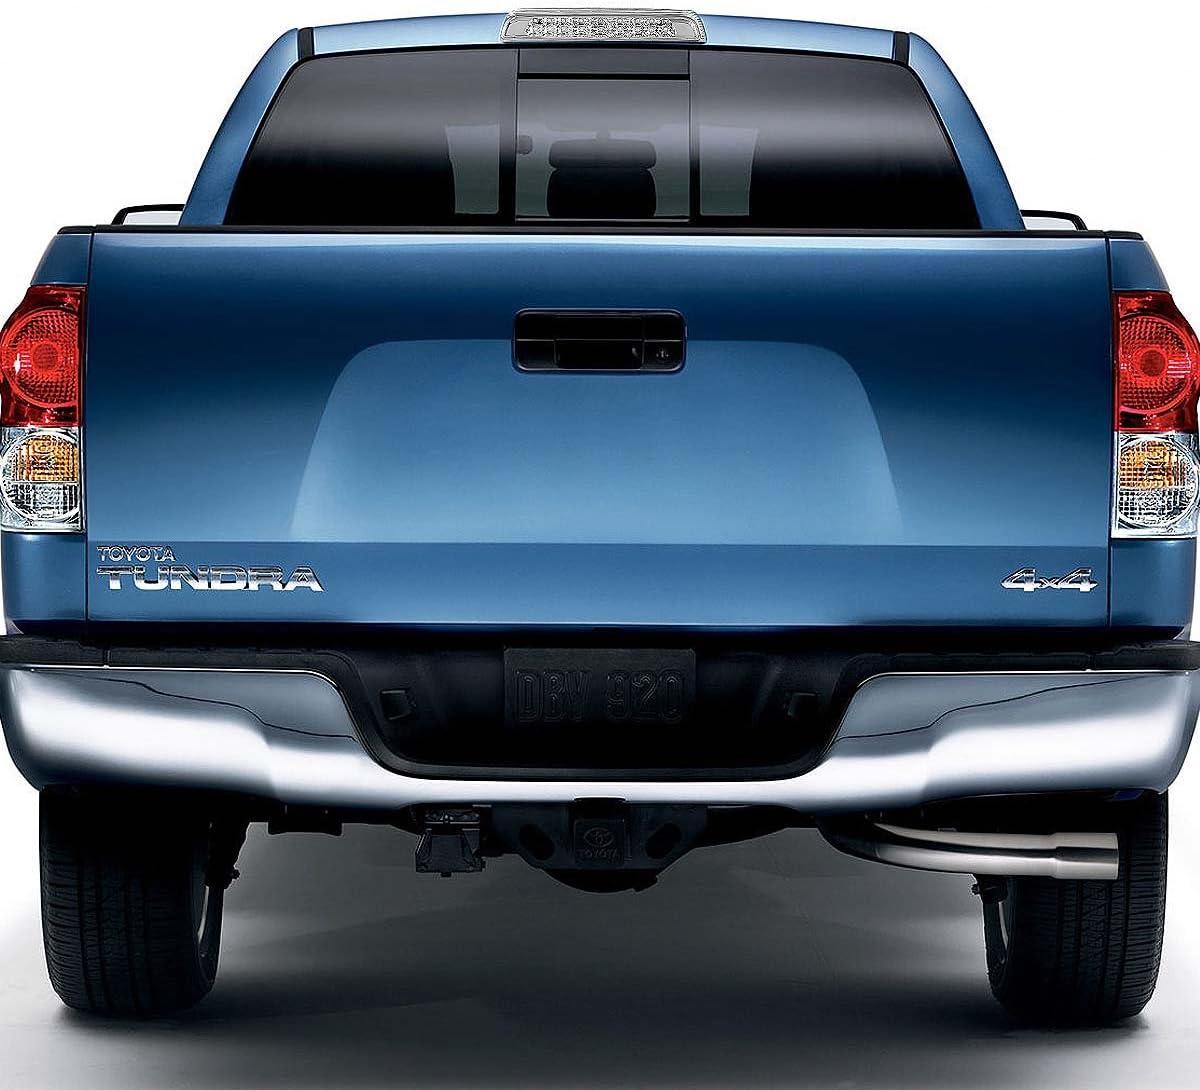 High Mount Black Housing Dual Row LED Rear 3rd Tail Brake Light Cargo Lamp for Toyota Tundra 07-18